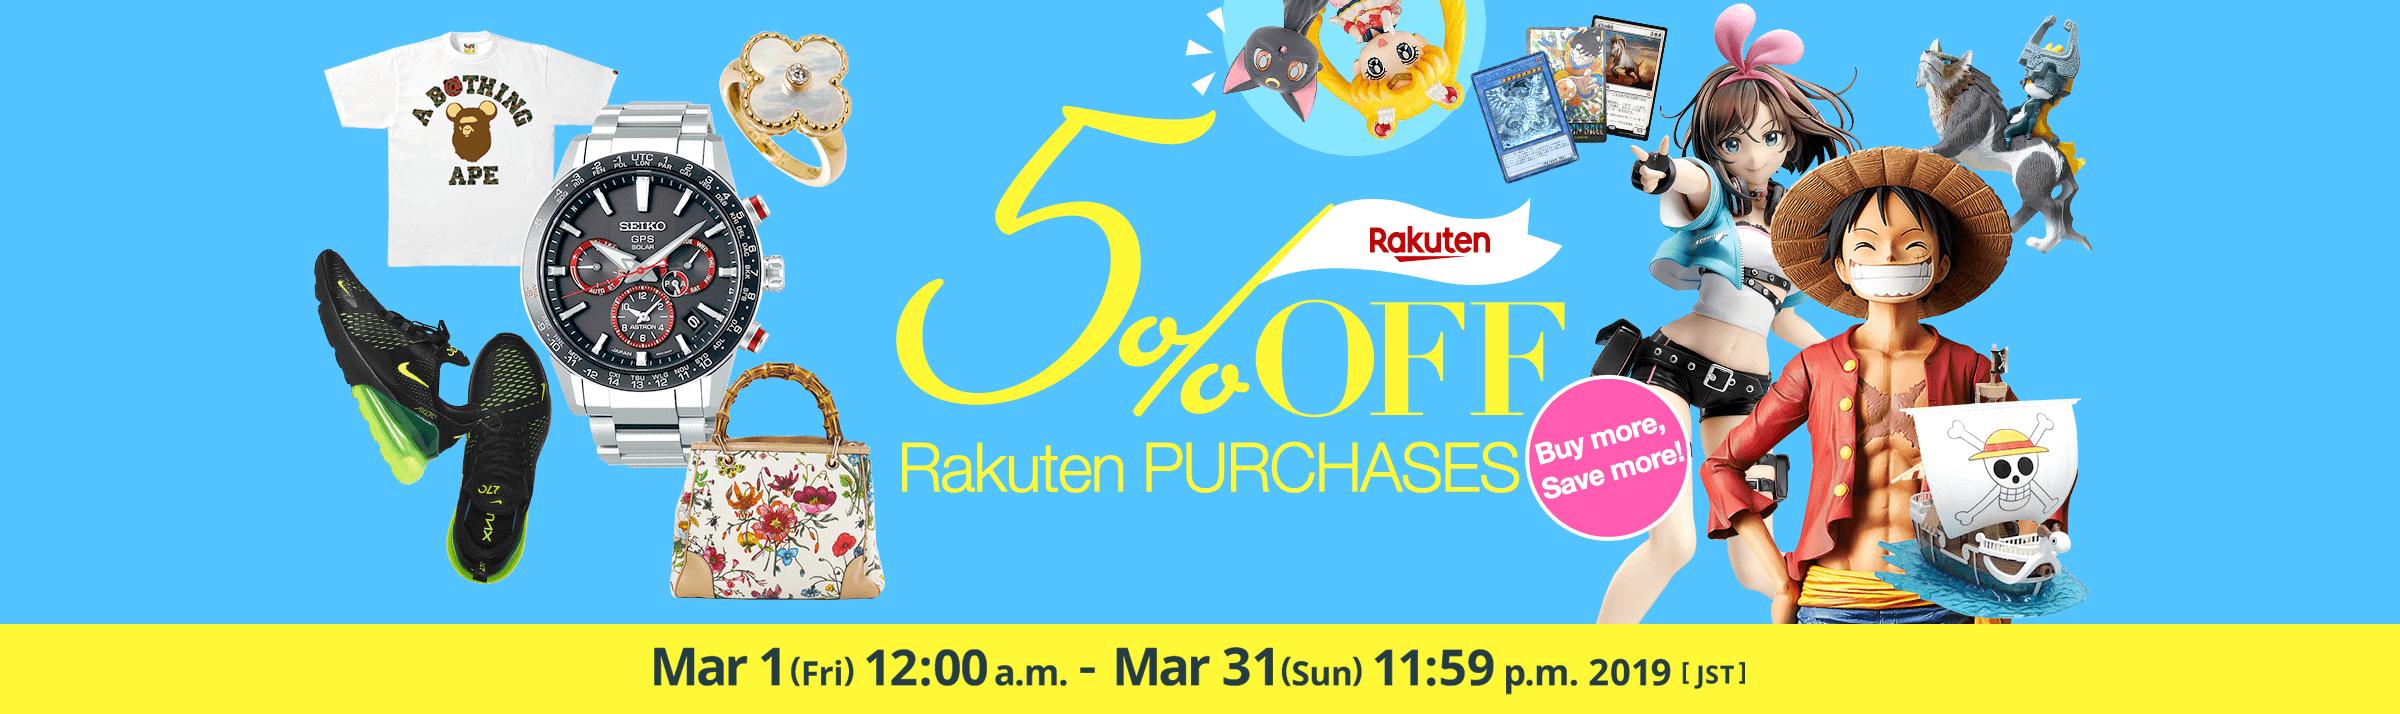 Earn 5% Cash Back on Rakuten Purchases